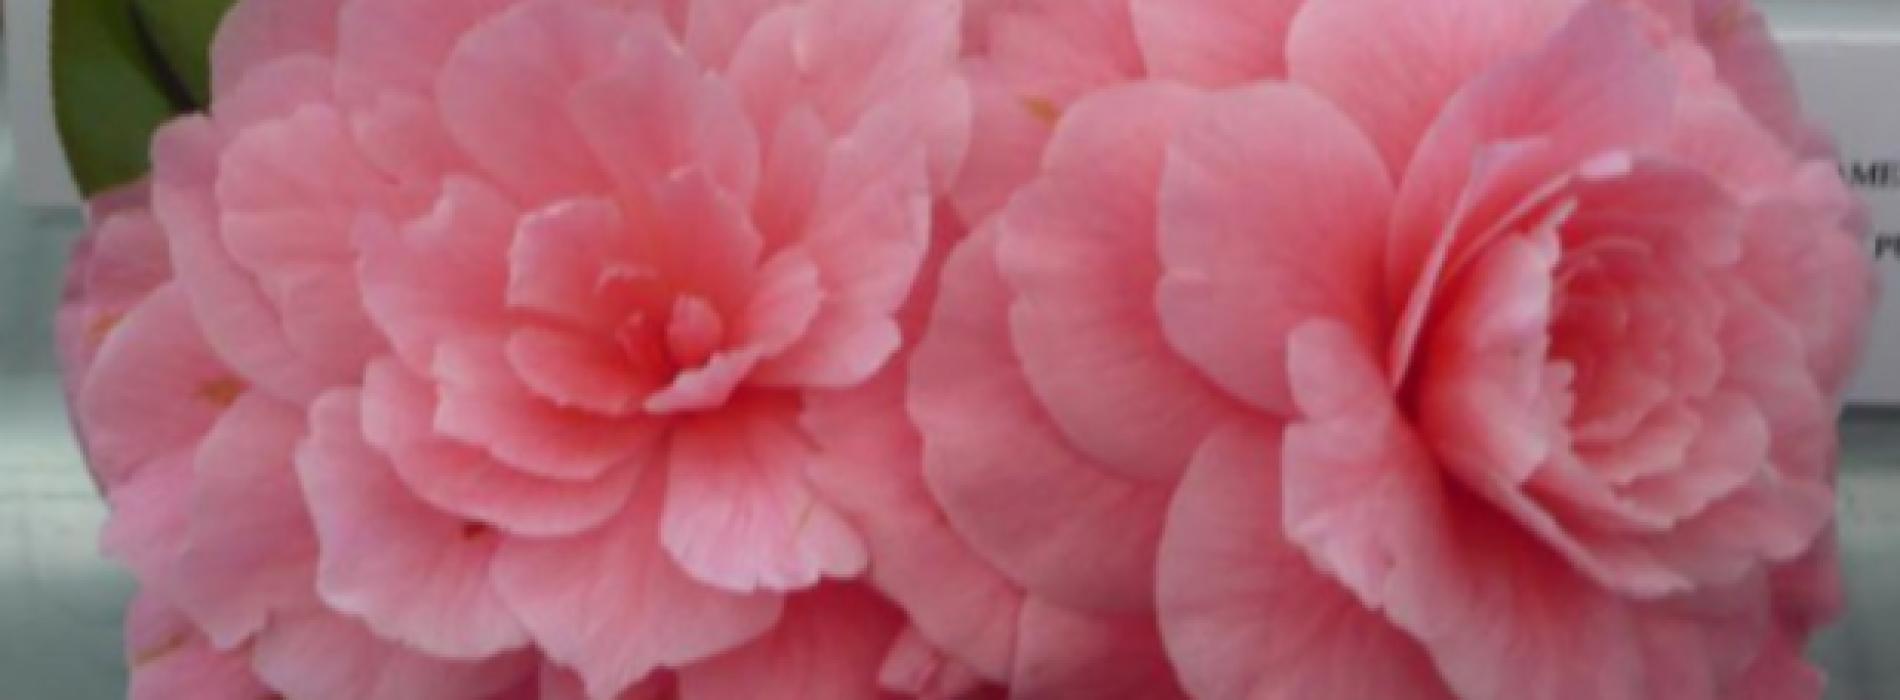 Fine settimana tra i fiori a Caserta. In mostra le camelie